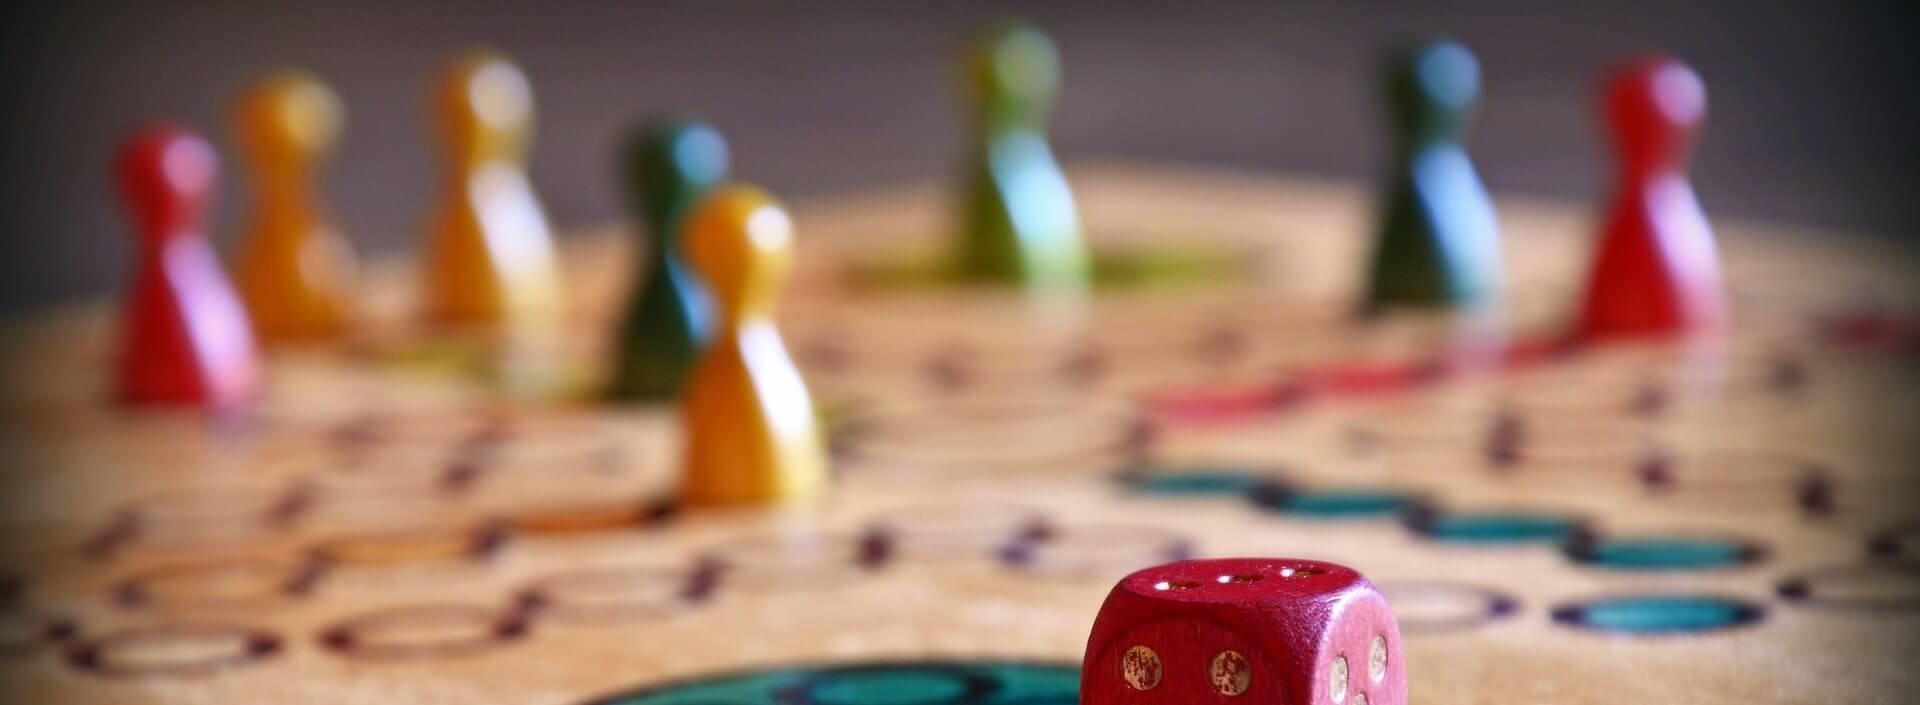 Brettspiel-Klassiker - Die beliebtesten Brettspiele aller Zeiten